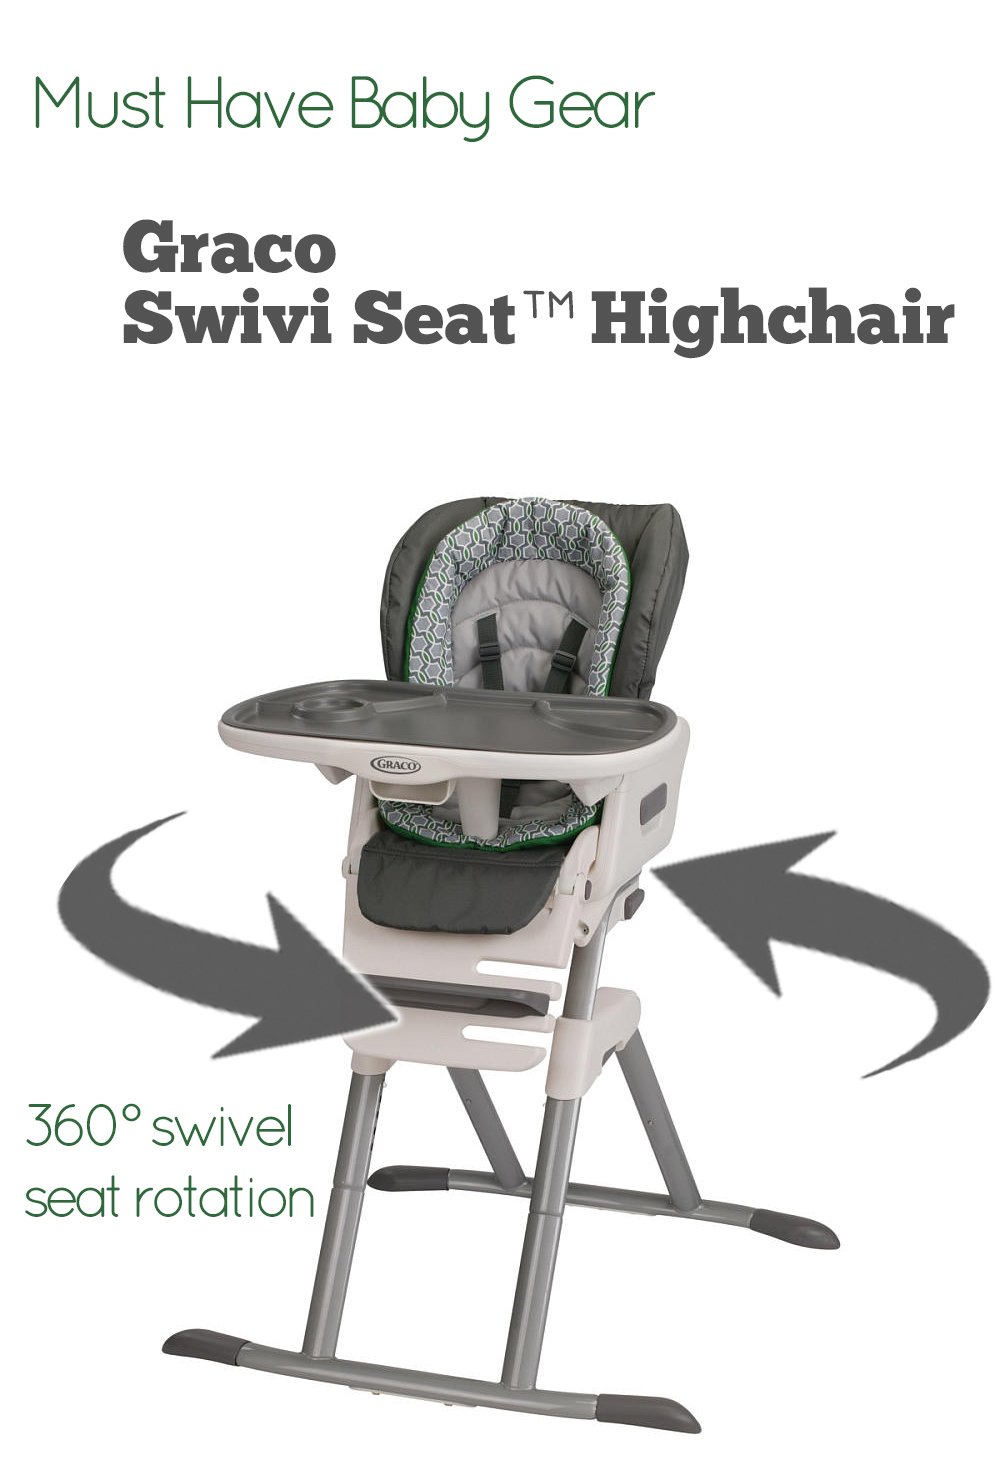 seat high chair swivel que significa en español closer look at the graco swivi highchair jamonkey